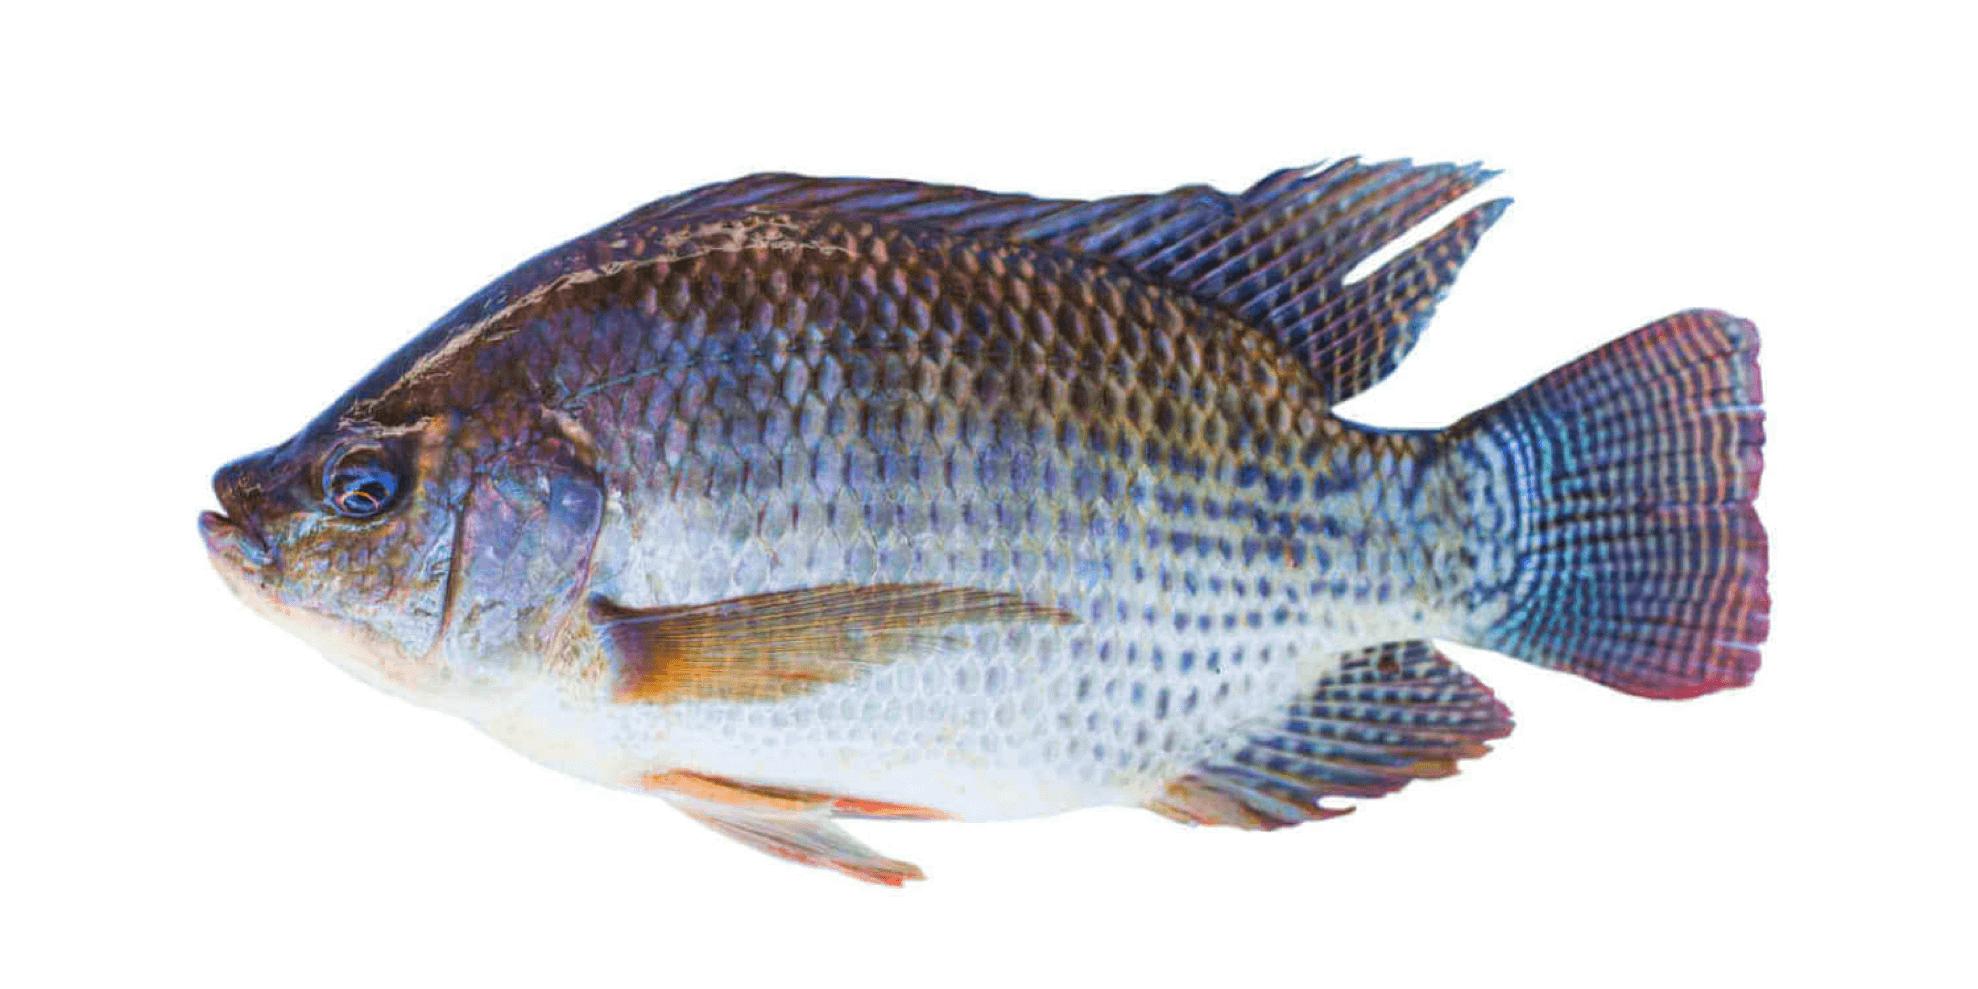 Fishing-Guide-How-to-Catch-Tilapia